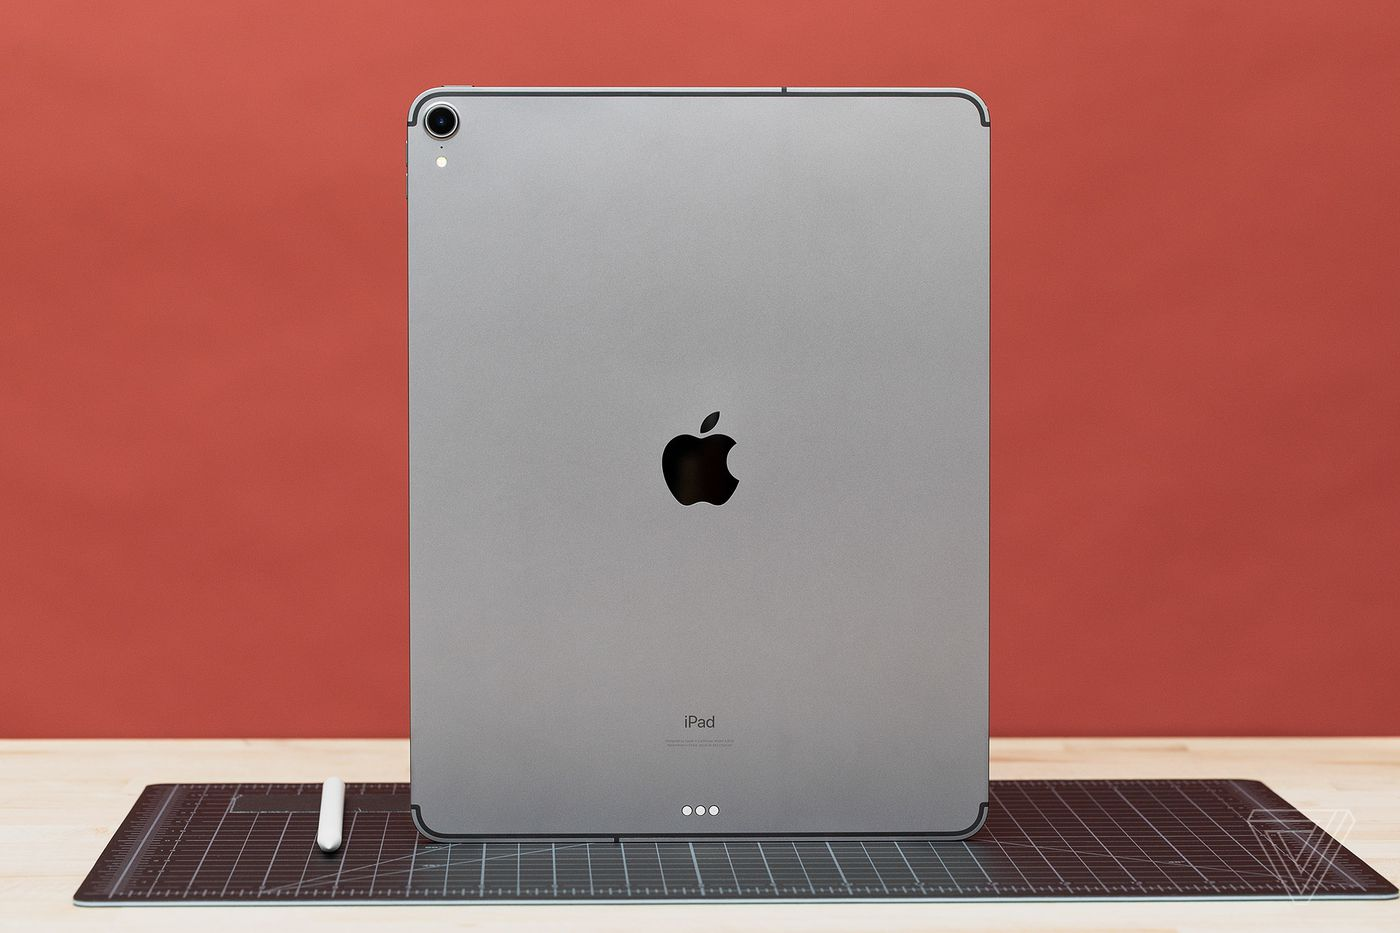 Apple iPad Pro review 2018: the fastest iPad is still an iPad - The